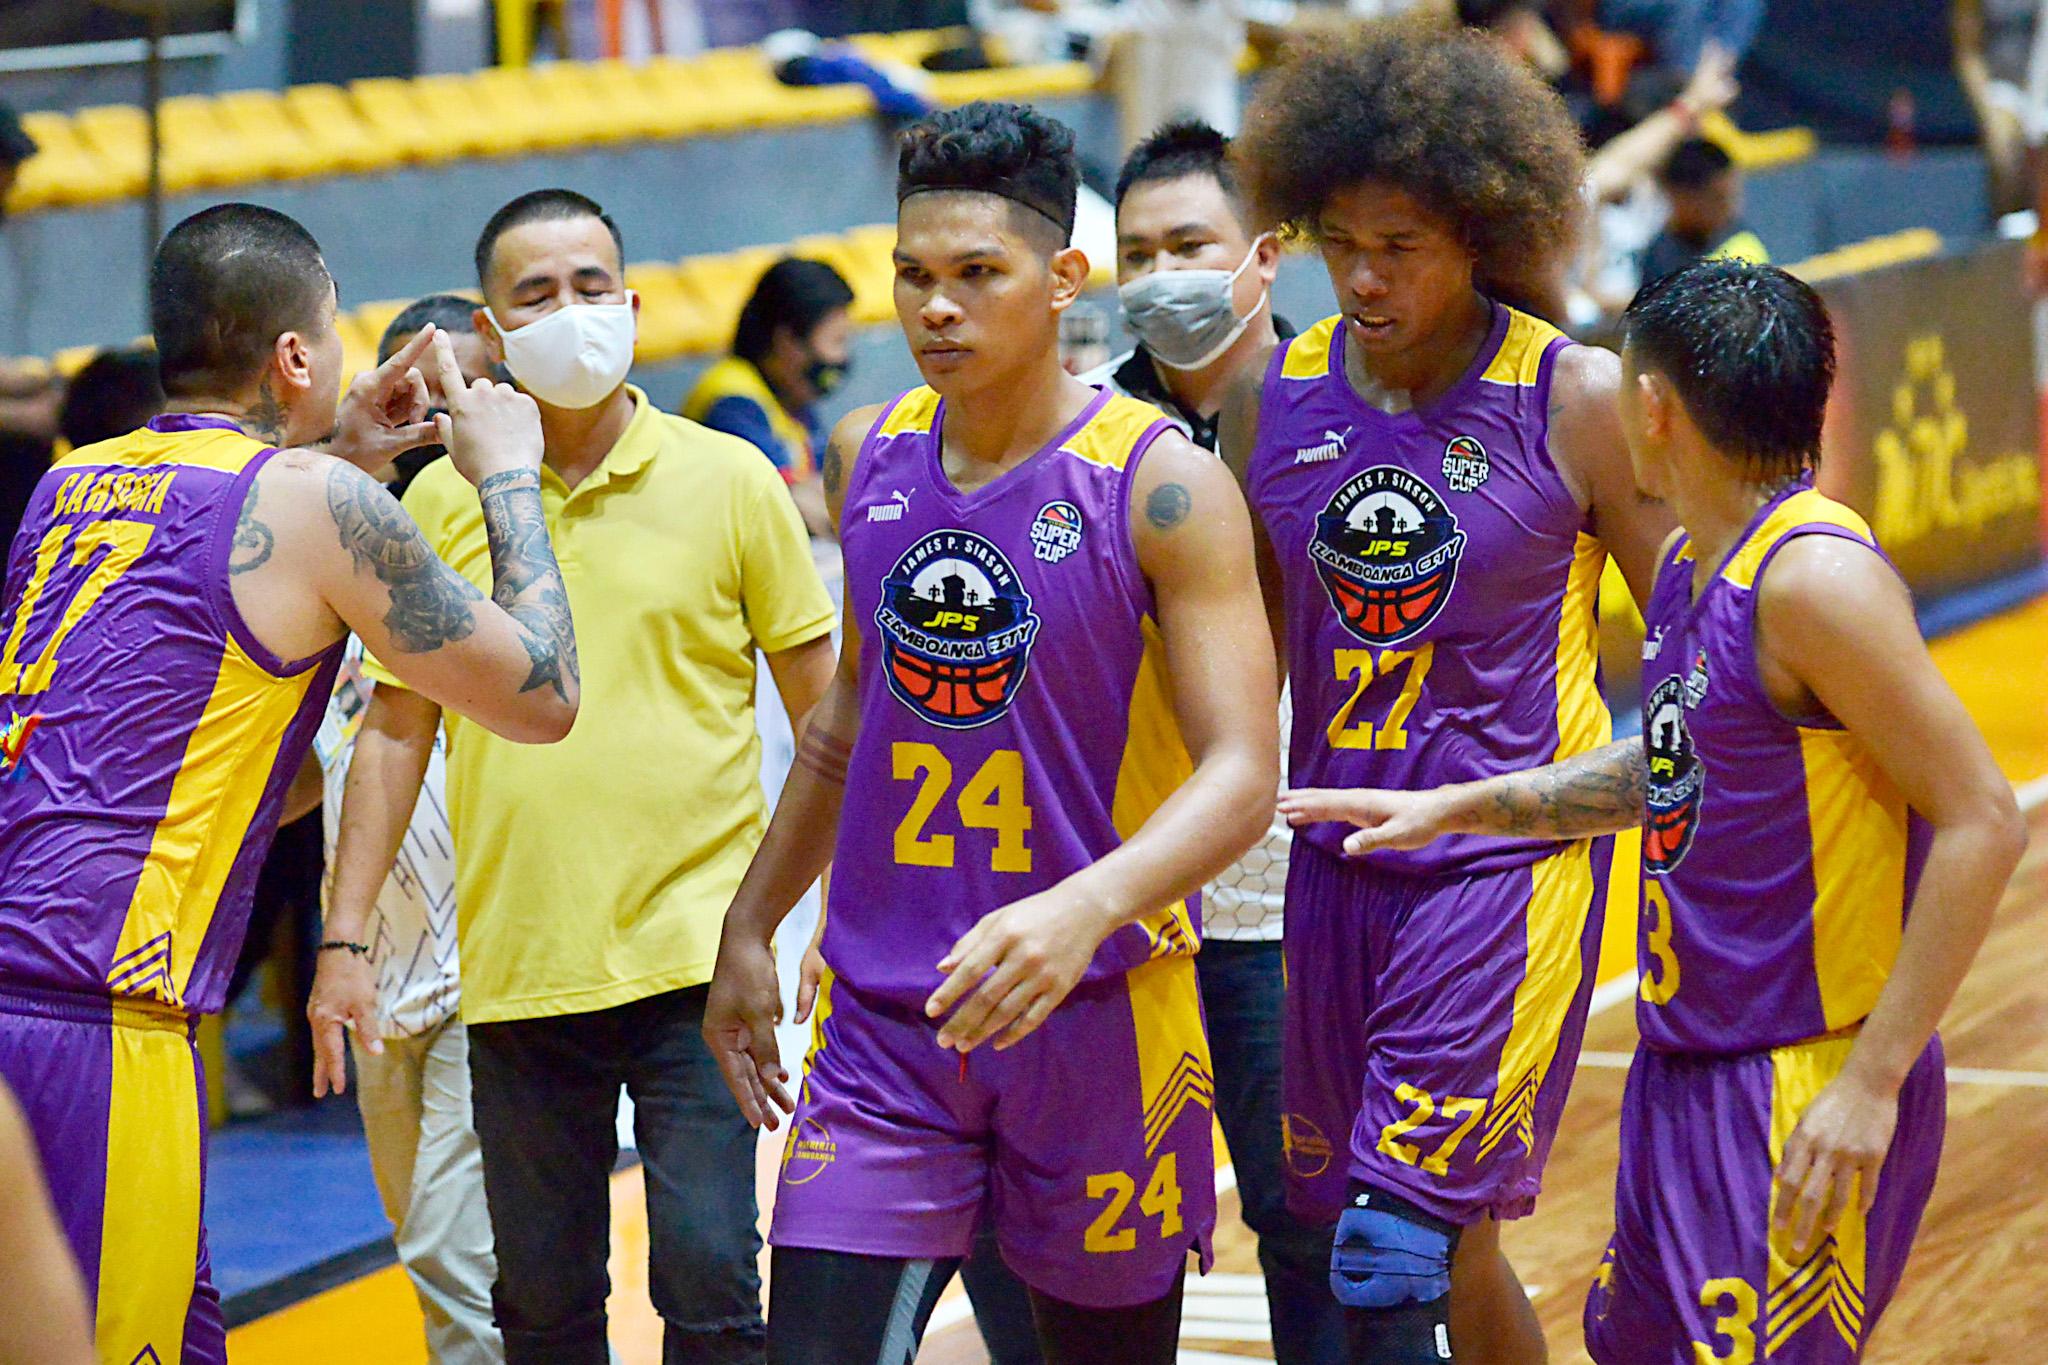 2021-Chooks-VisMin-Mindanao-SF-1-Clarin-vs-Zamboanga-City-Jerome-Ferrer Eumir Marcial inspires Zamboanga to knockout Clarin in VisMin Basketball News VisMin Super Cup  - philippine sports news